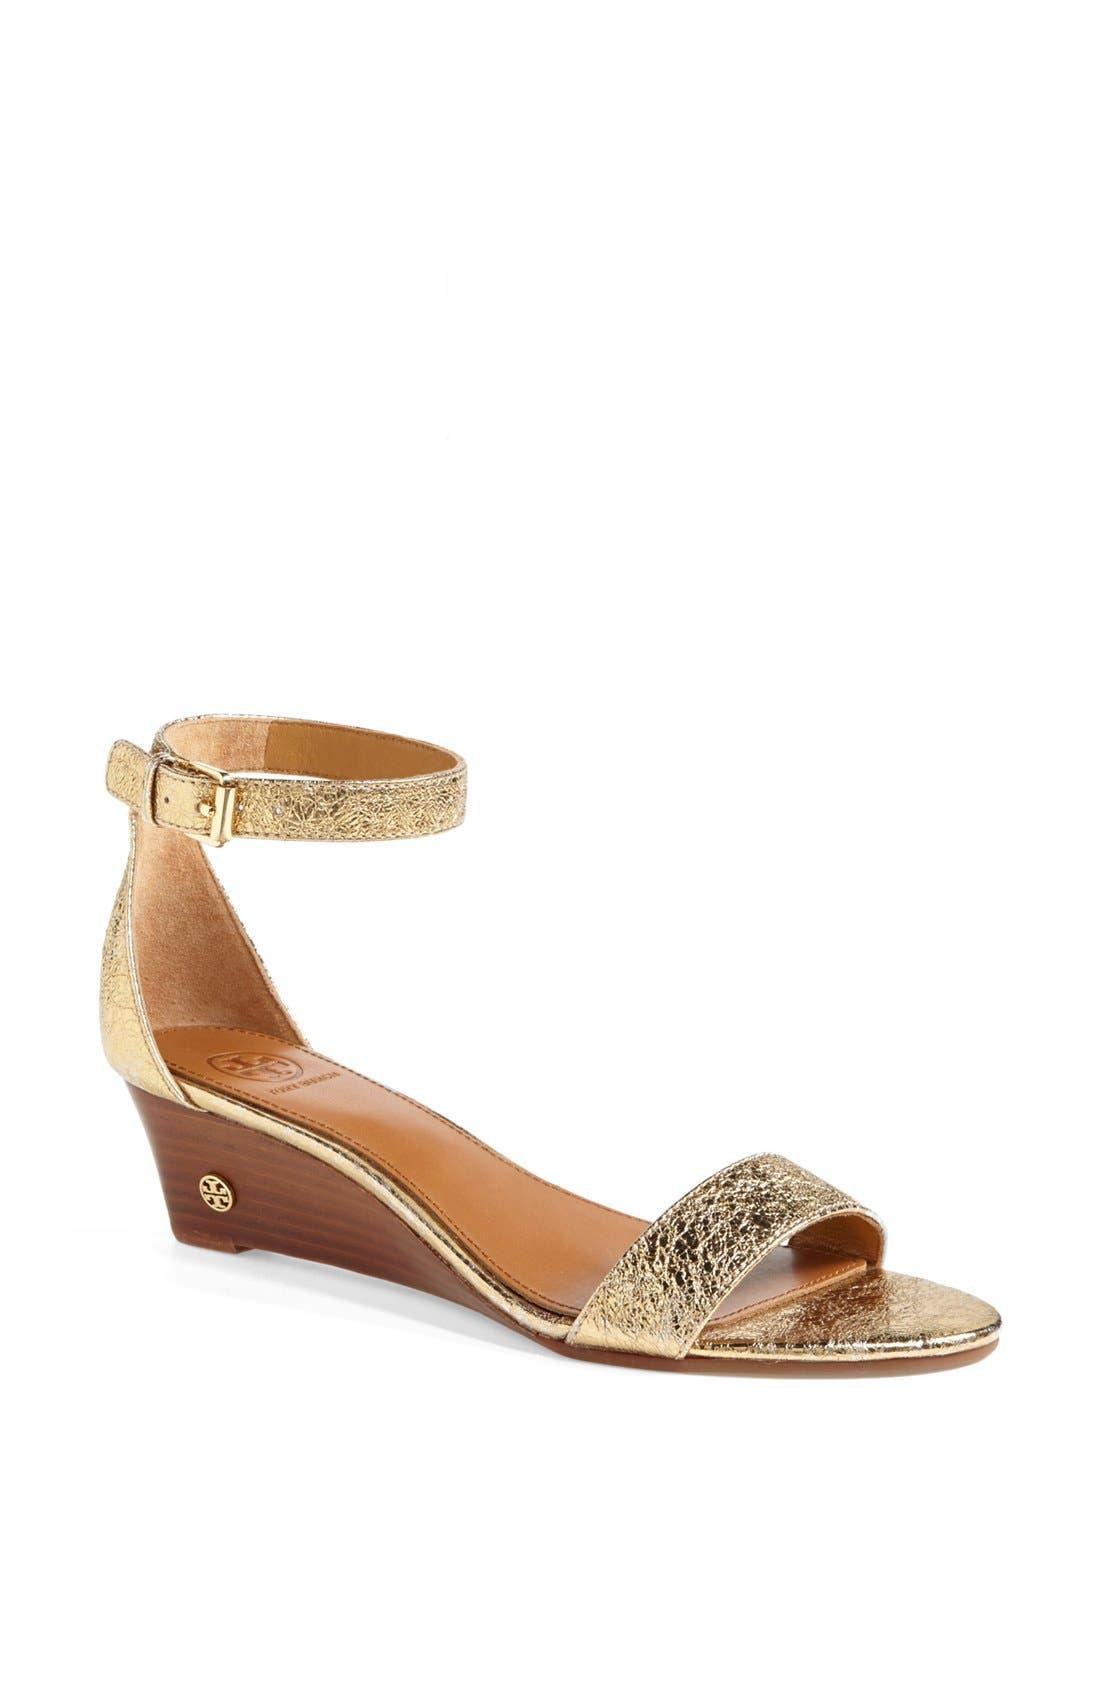 Alternate Image 1 Selected - Tory Burch 'Savannah' Wedge Sandal